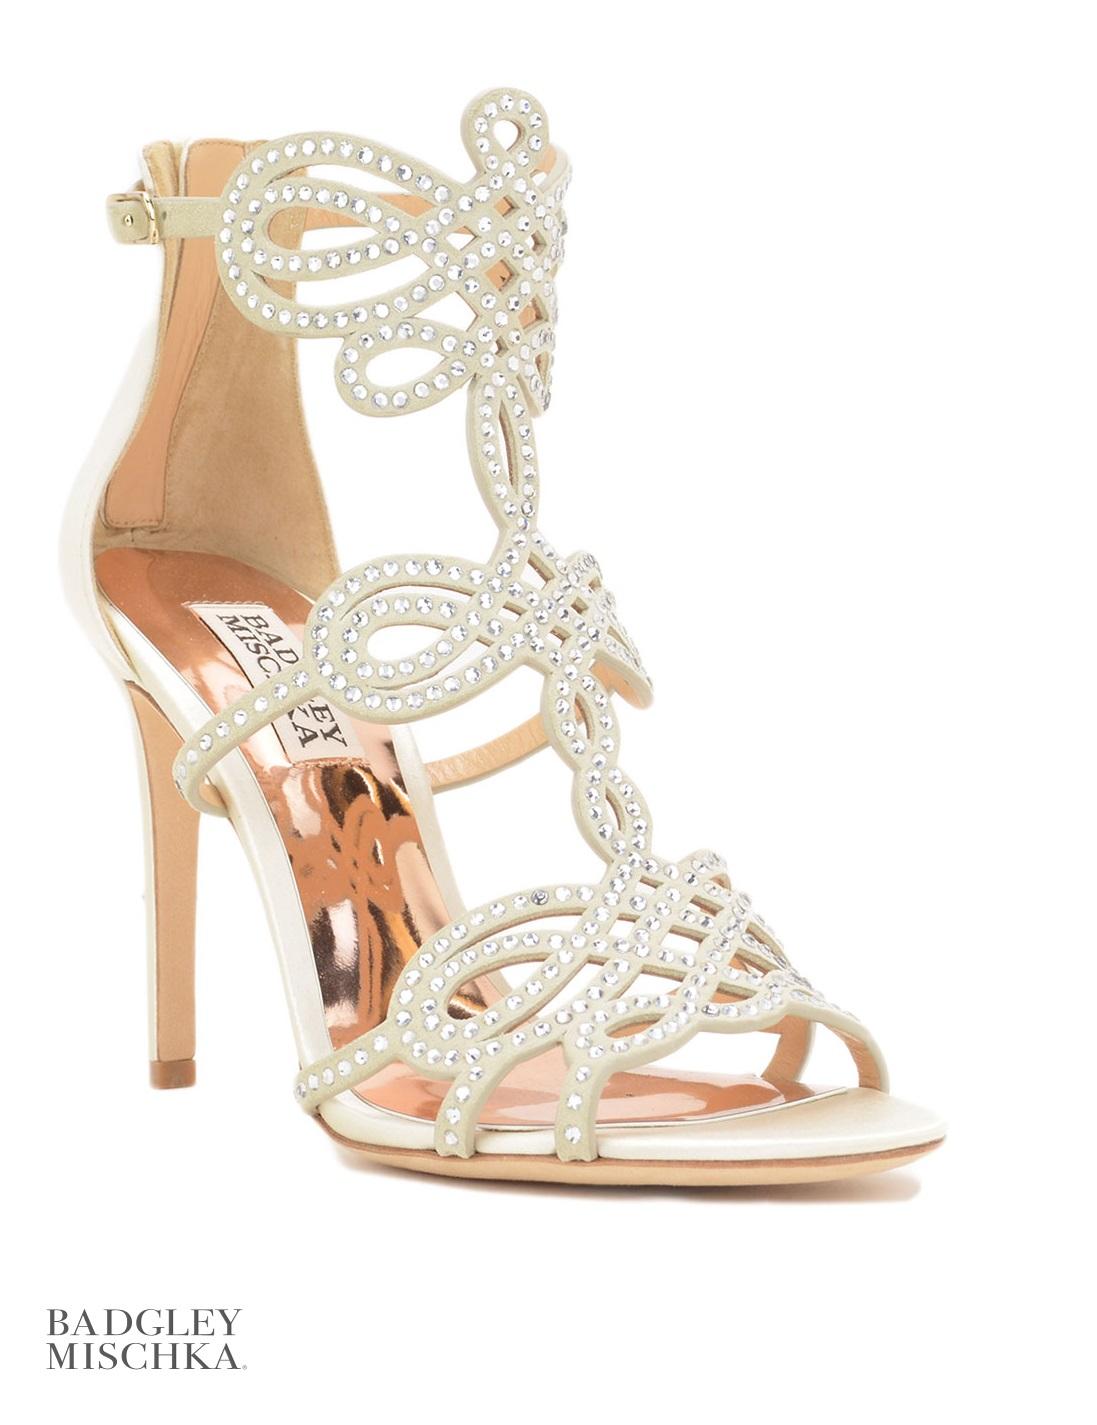 Badgley Mischka5 - Sapatos de princesa